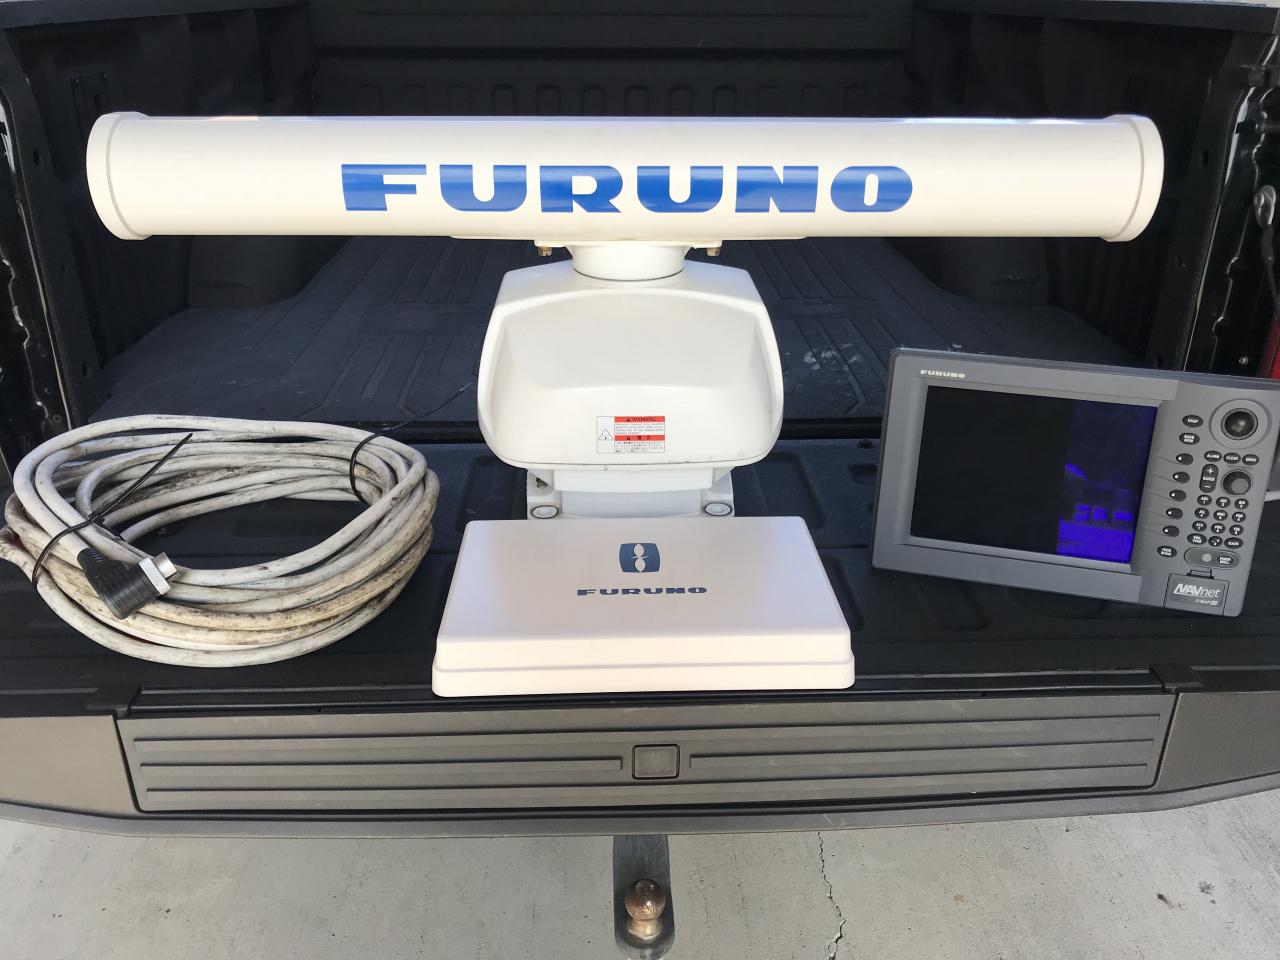 5 Furuno 6kw 4' Open Array Radar + Display + Cable-img_8151-jpg